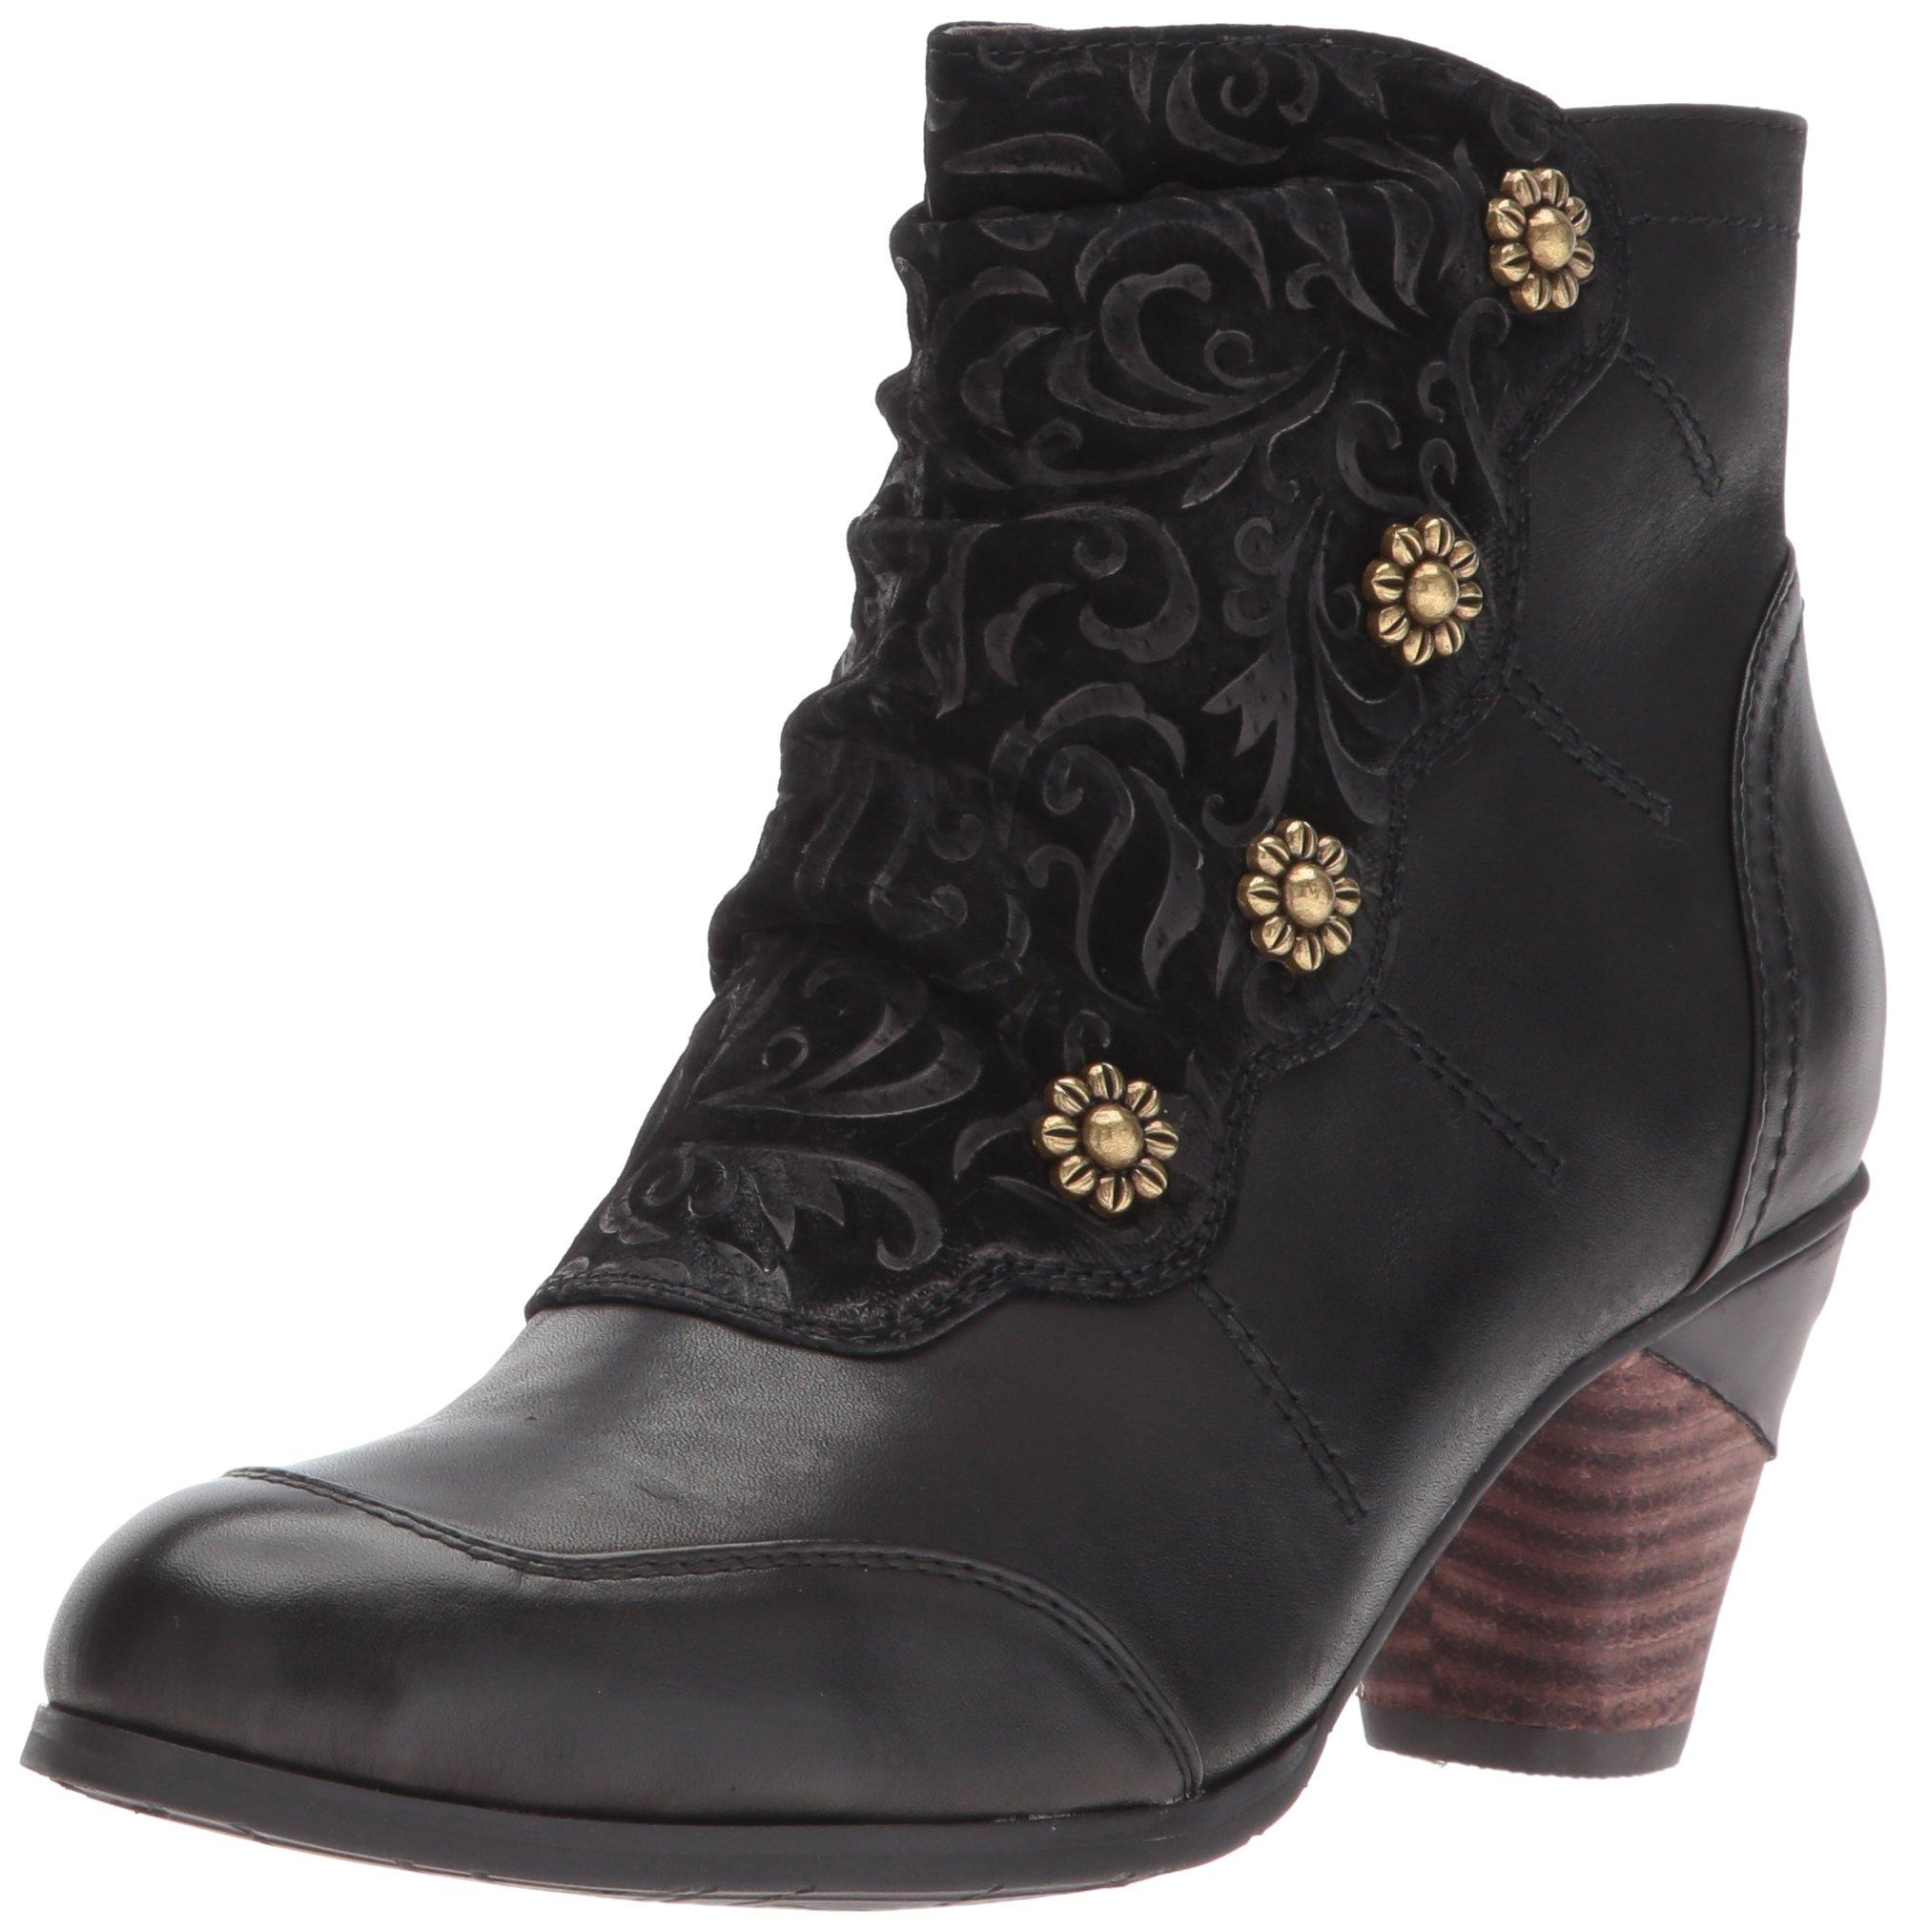 L'artiste By Spring Step Women's Belgard Ankle Bootie, black, 38 EU/7.5 - 8 M US